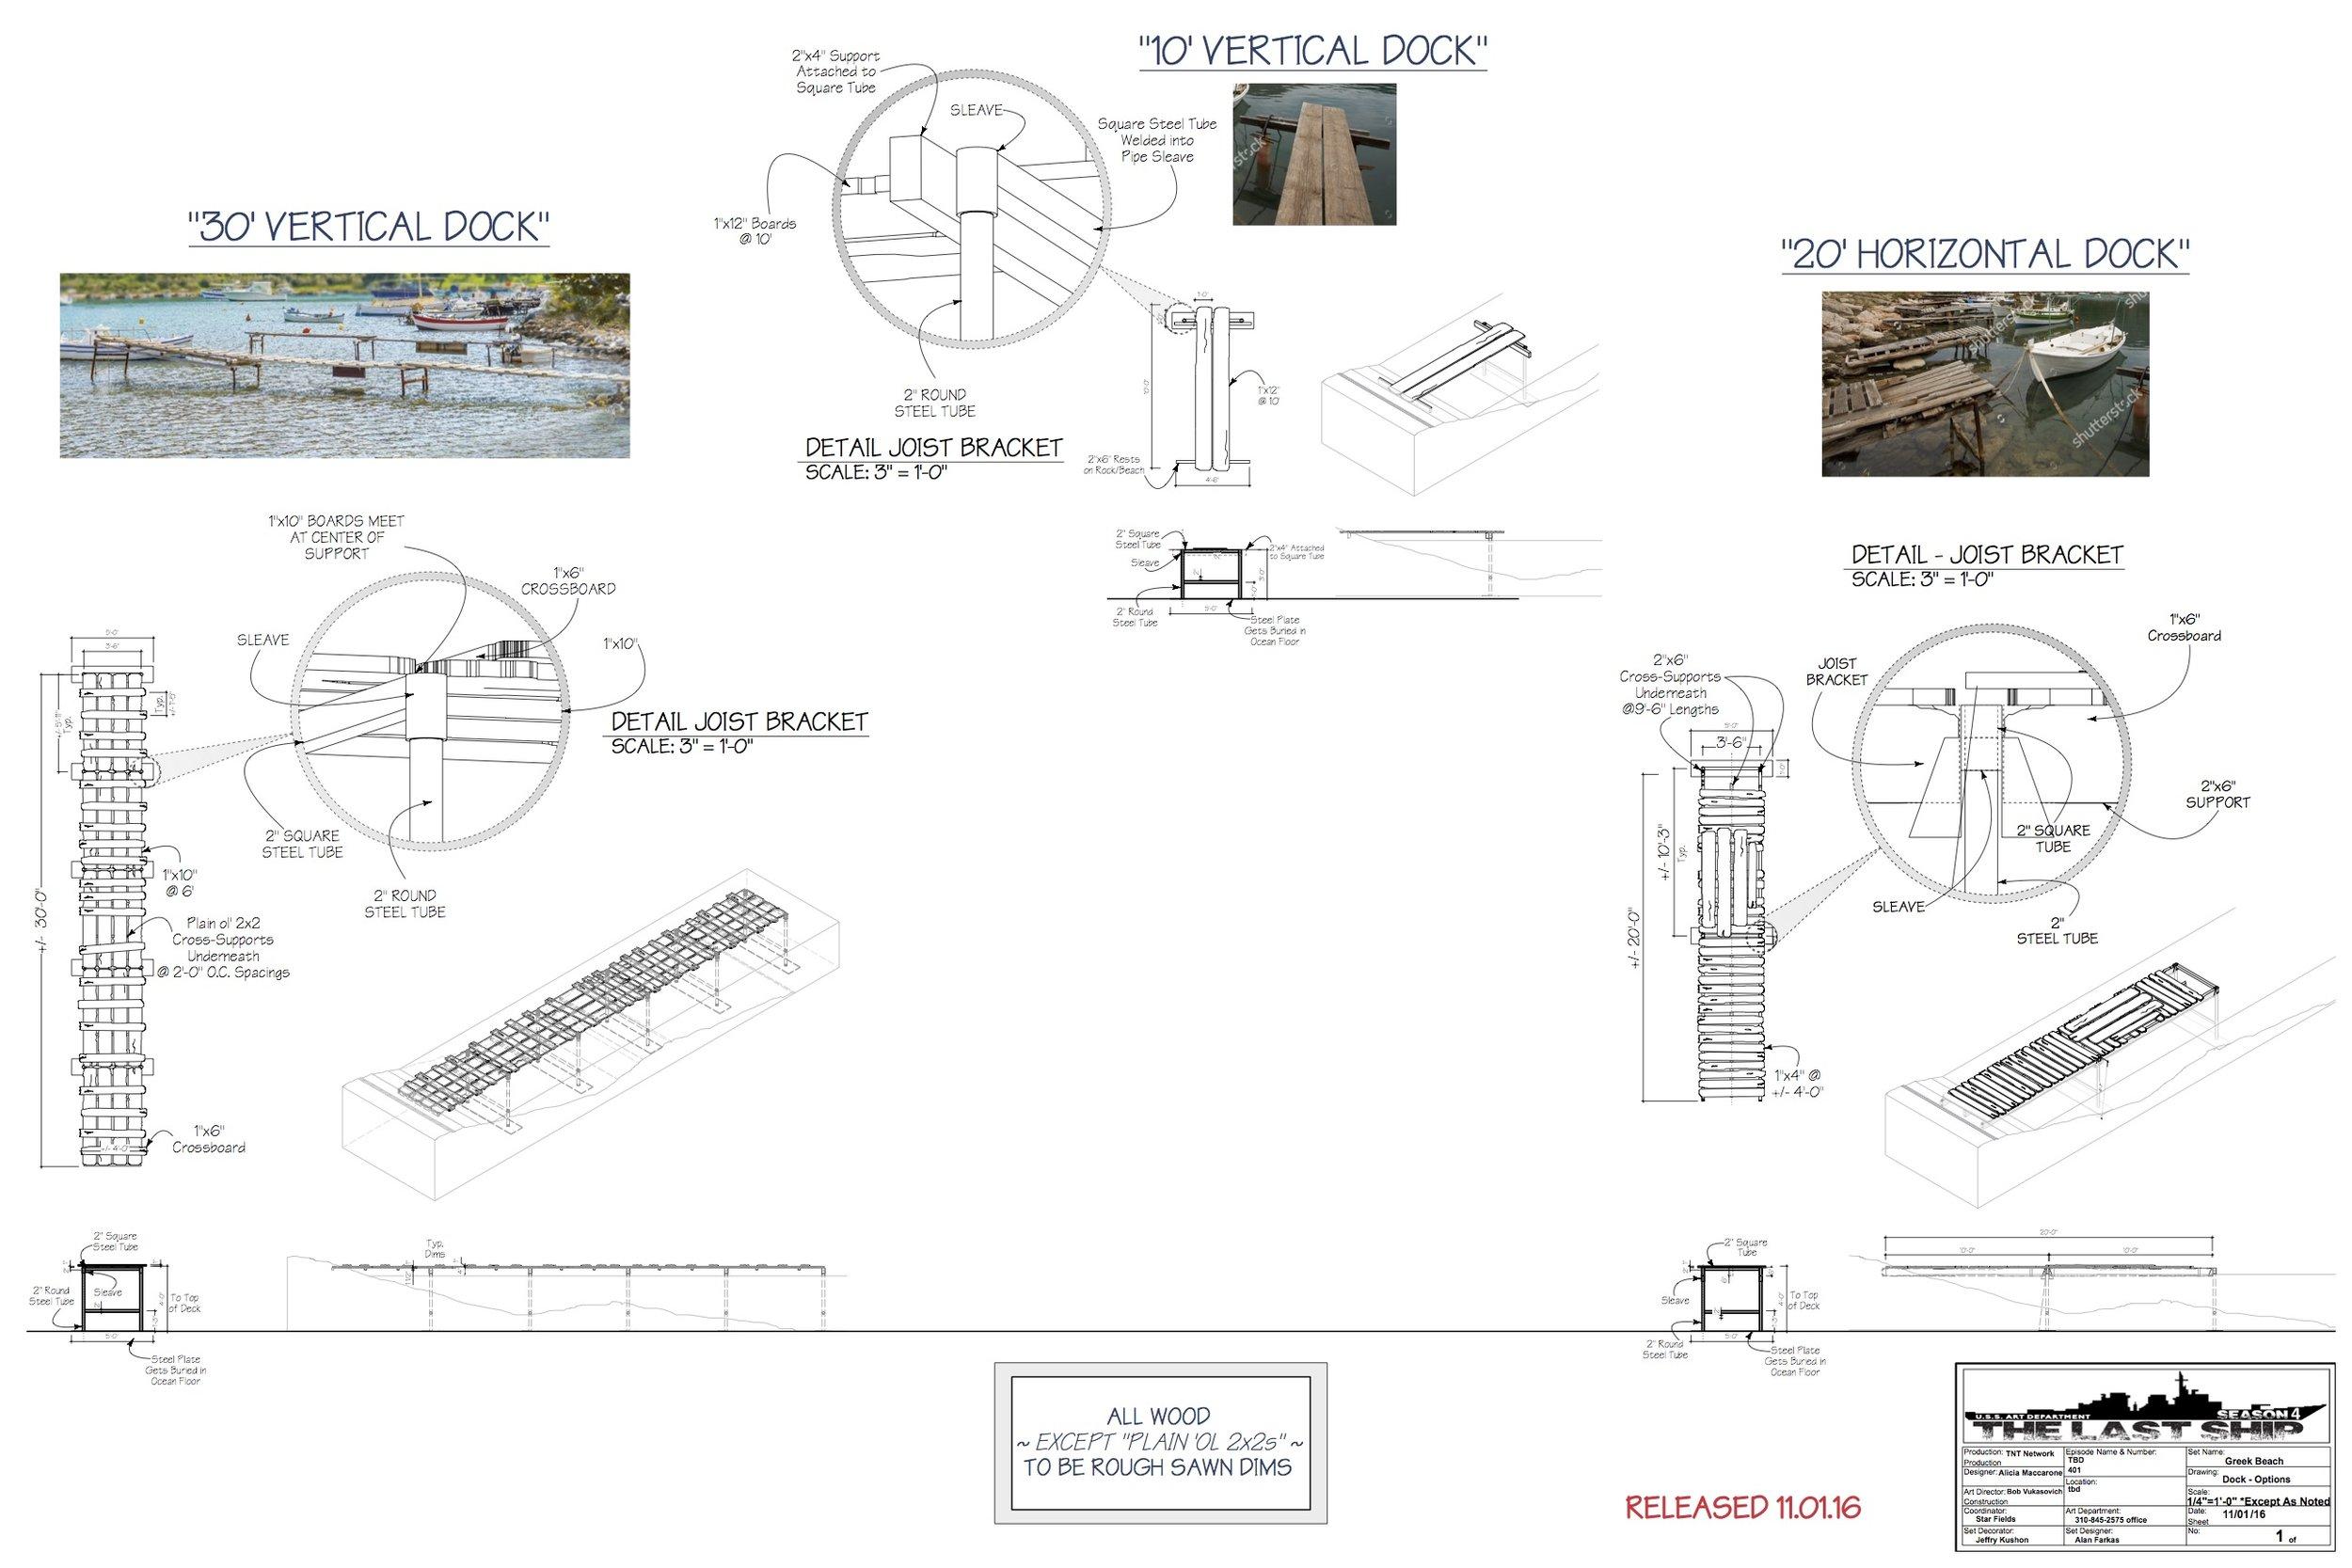 401_Docks_GreekBeach_Ext_Rel_AMF_16-1101.jpeg